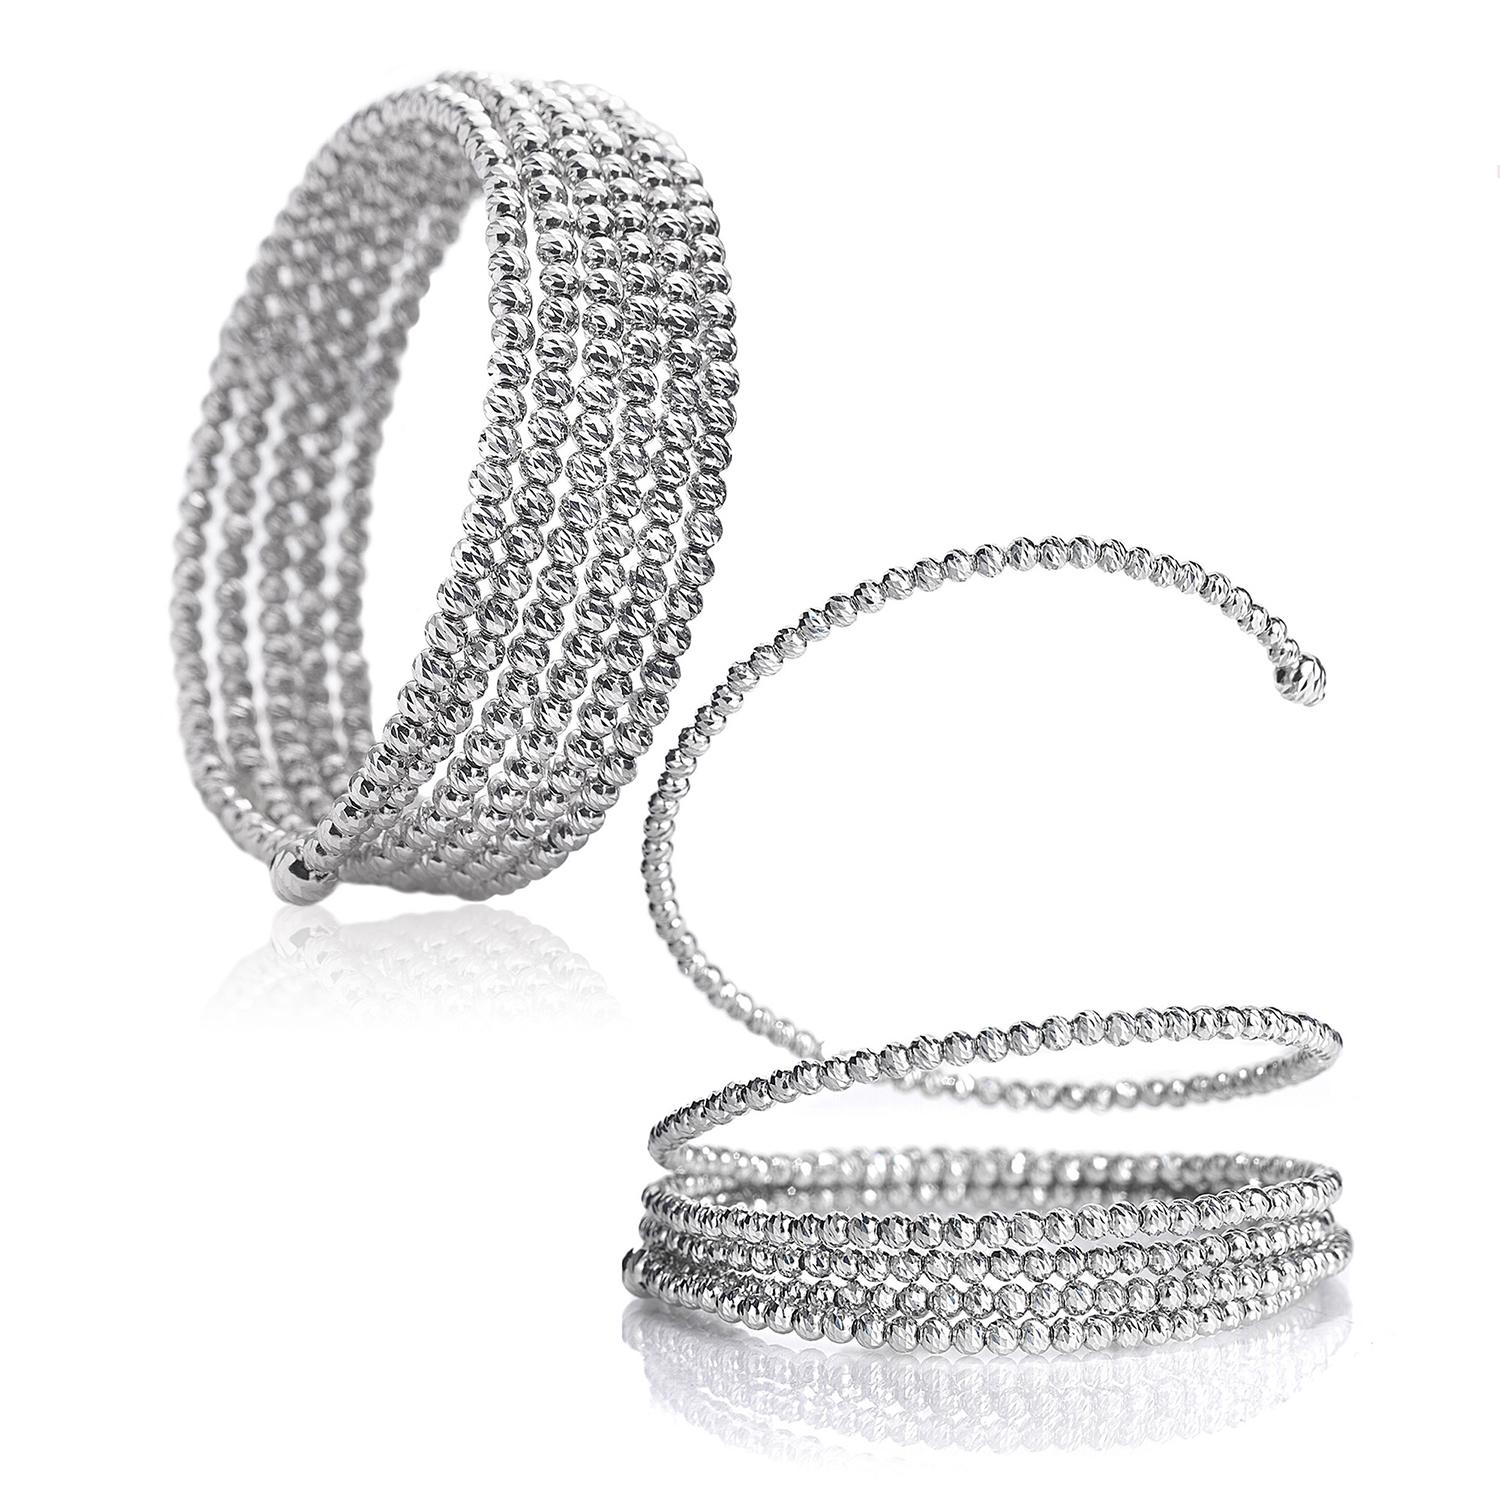 INSTORE Design Awards 2021 – Platinum Jewelry